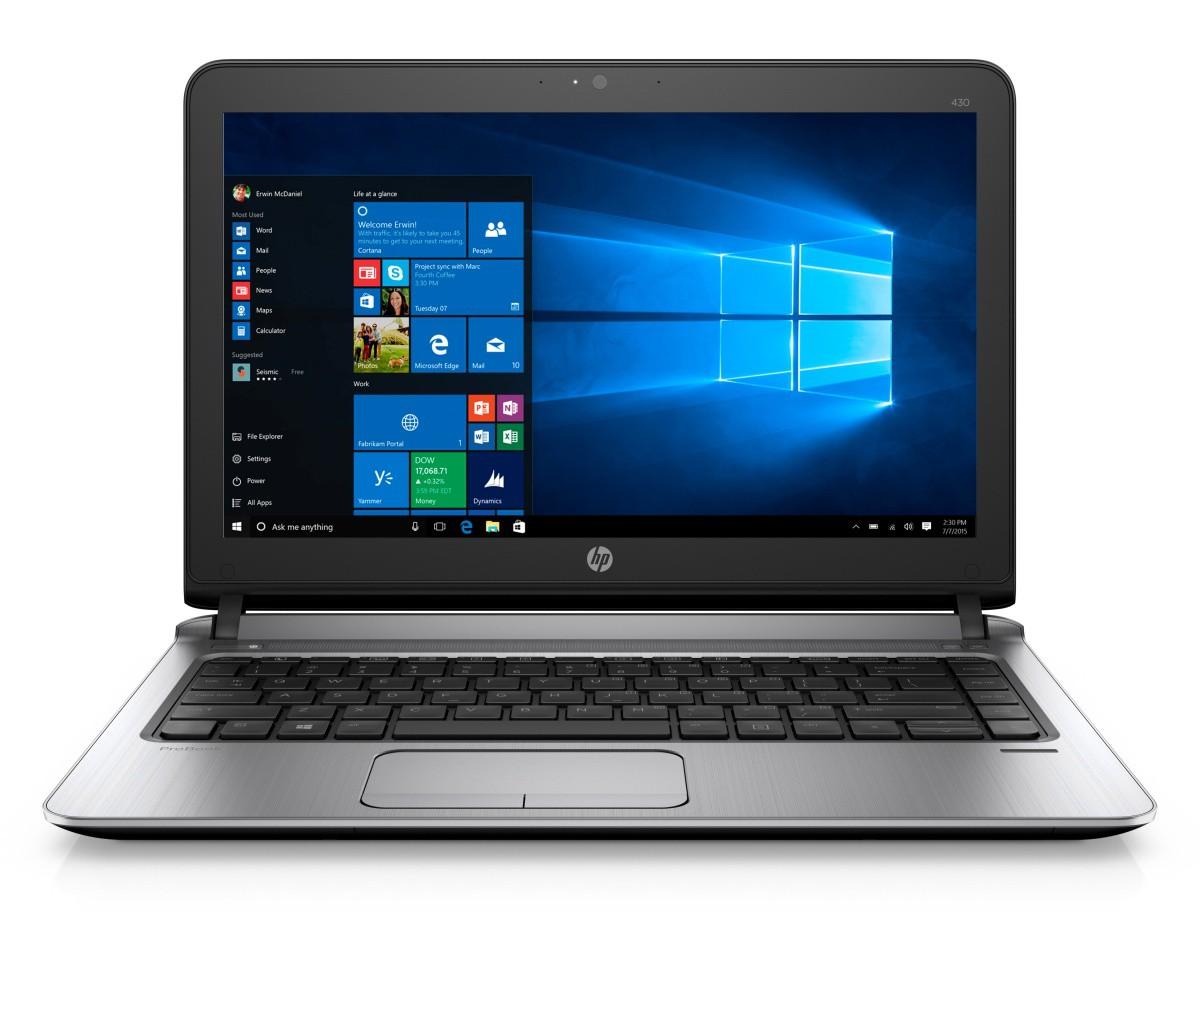 Notebook HP ProBook 430 G3 (W4P03ES)